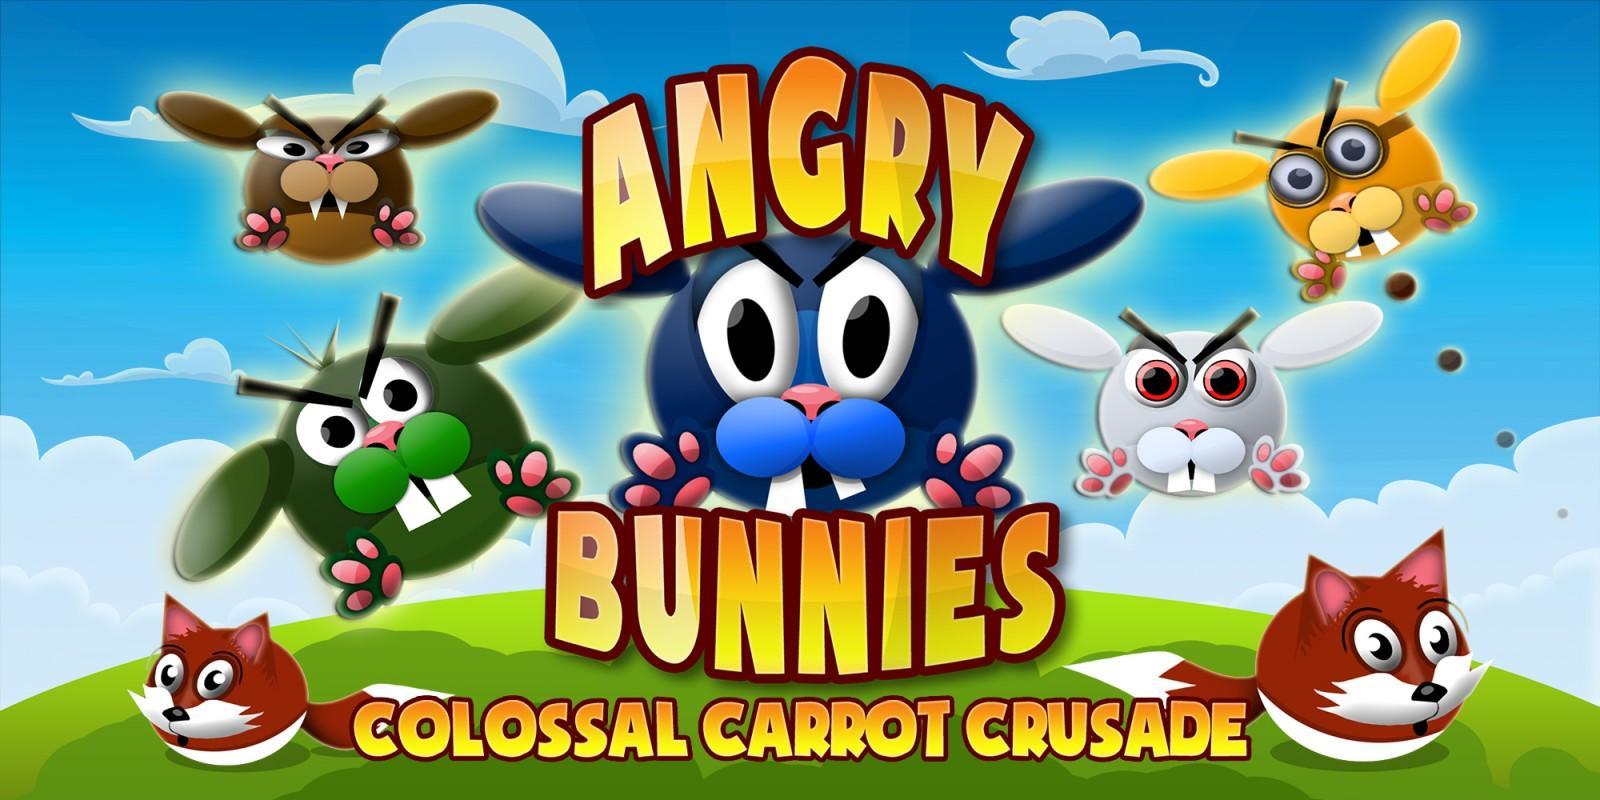 Angry Bunnies - Mejores juegos gratis para NIntendo Switch